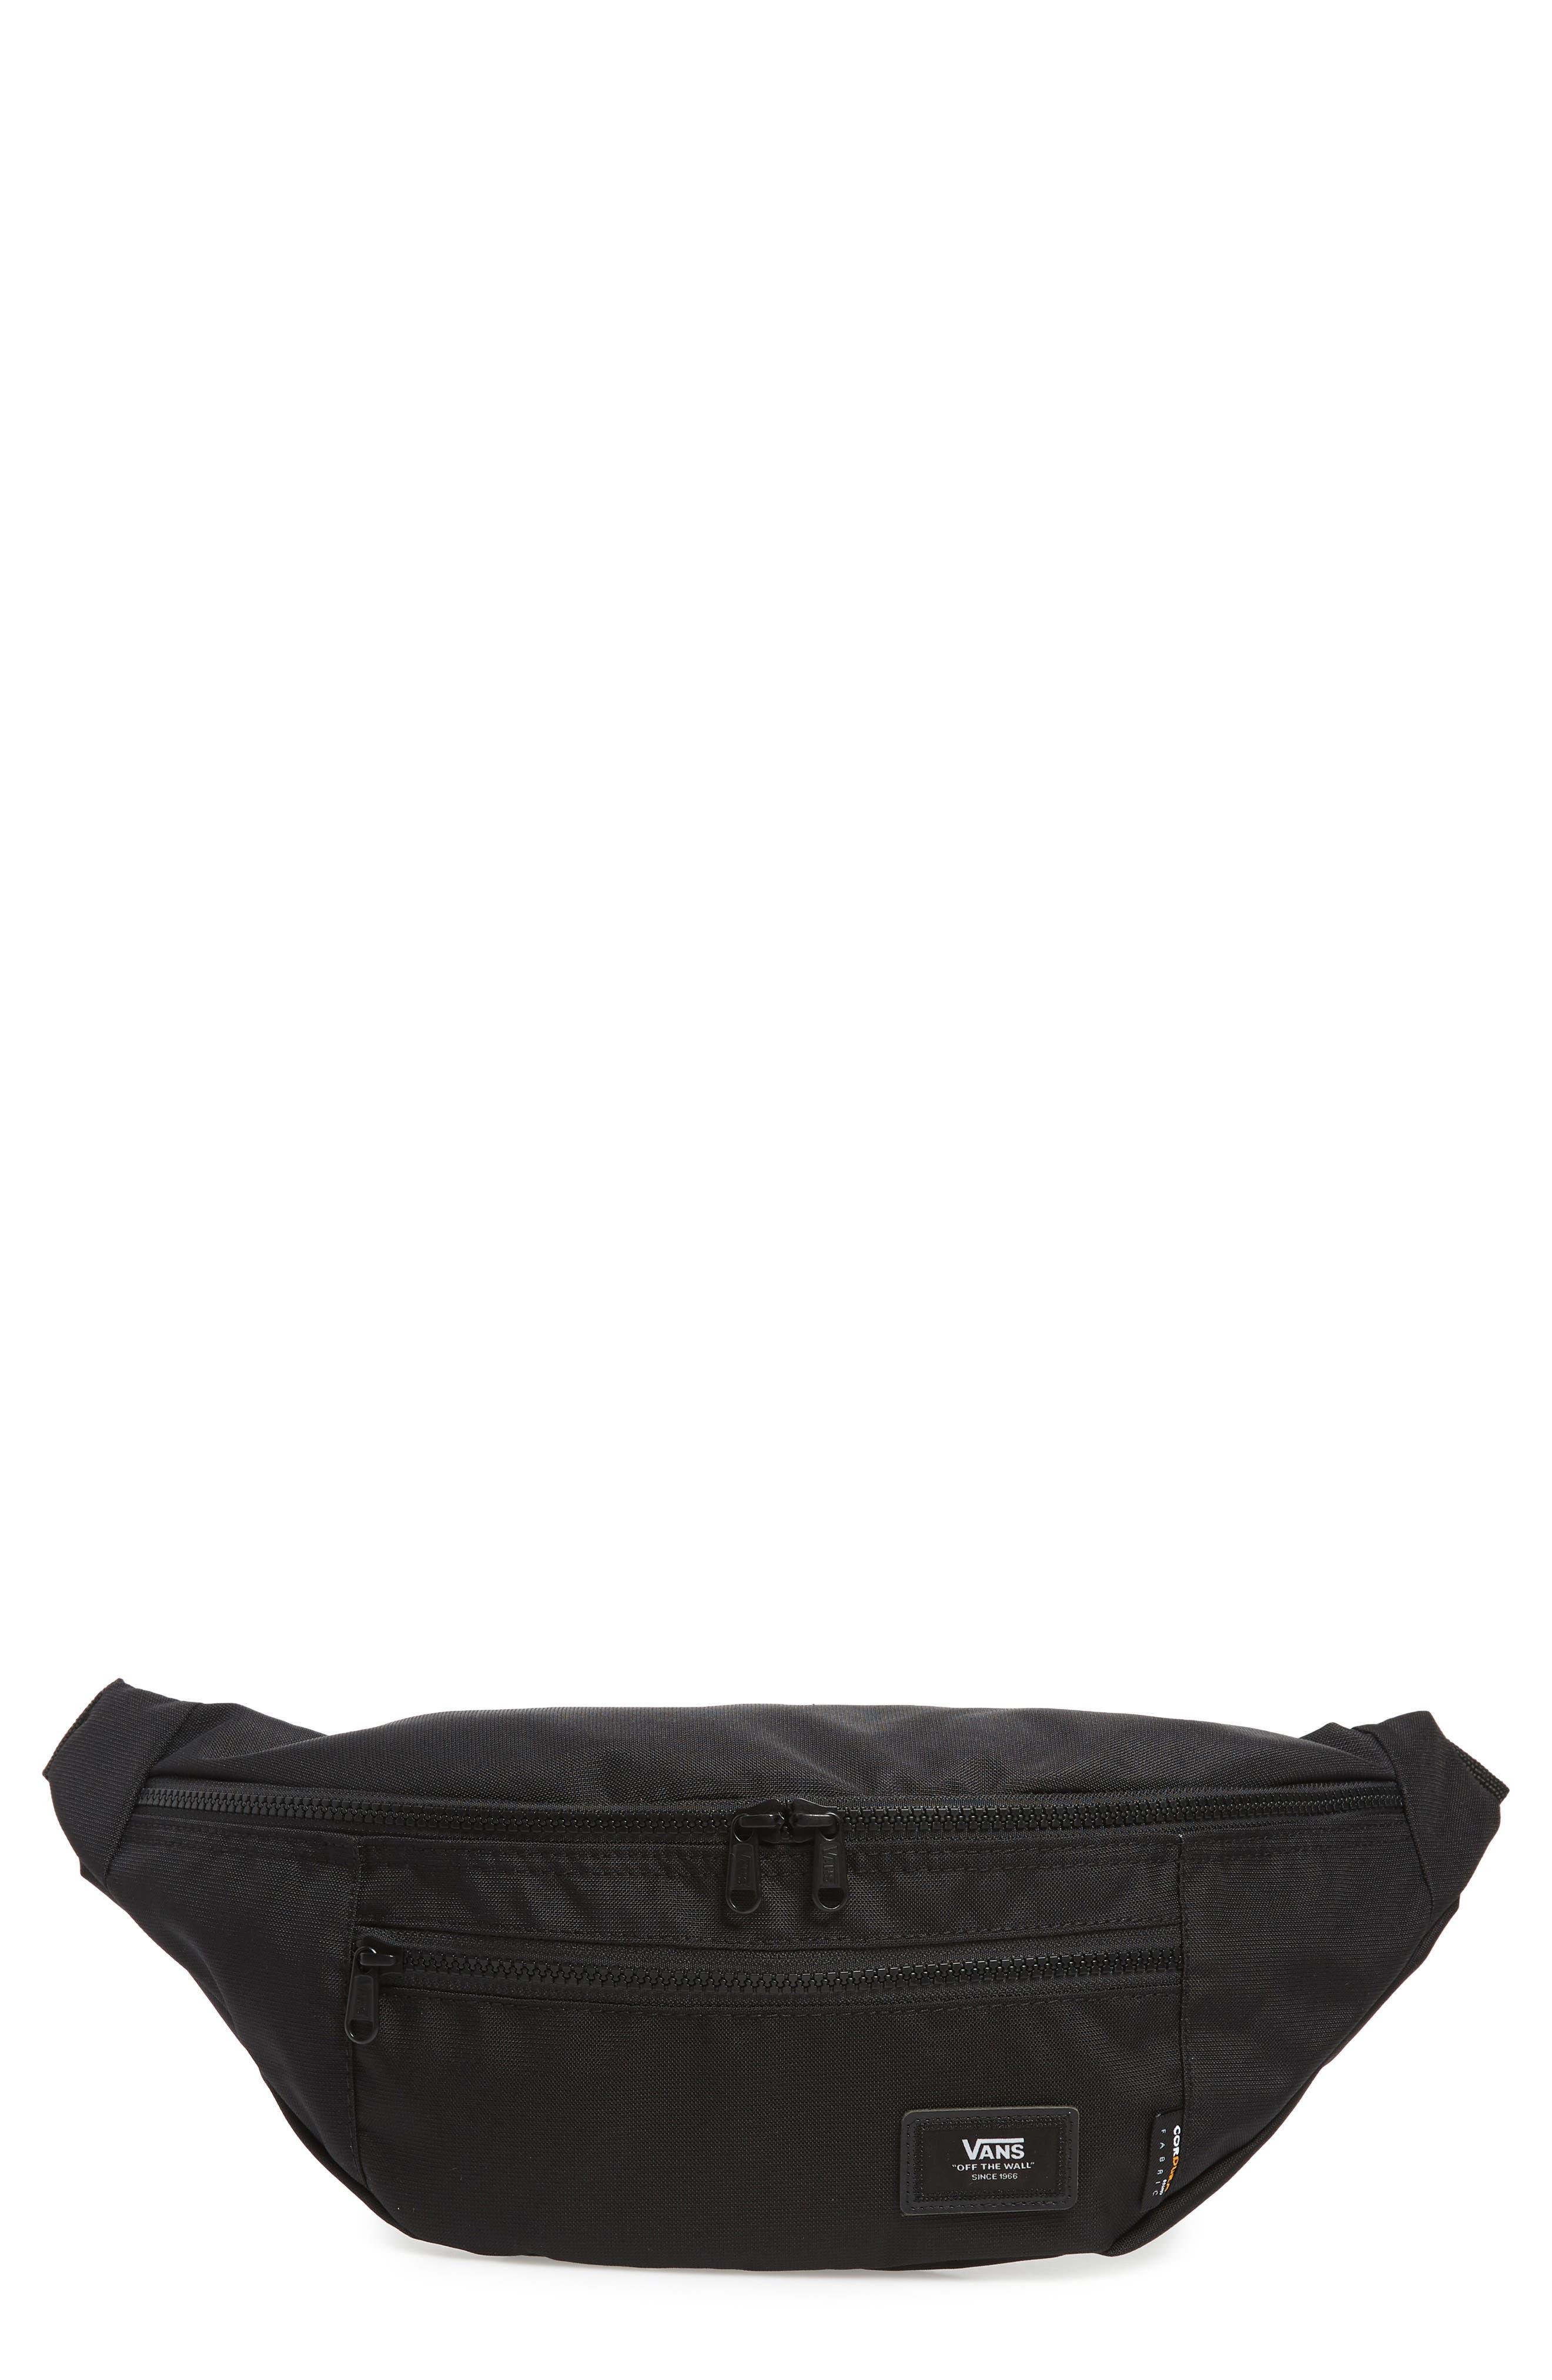 VANS Ward Water Repellent Waist Pack, Main, color, BLACK